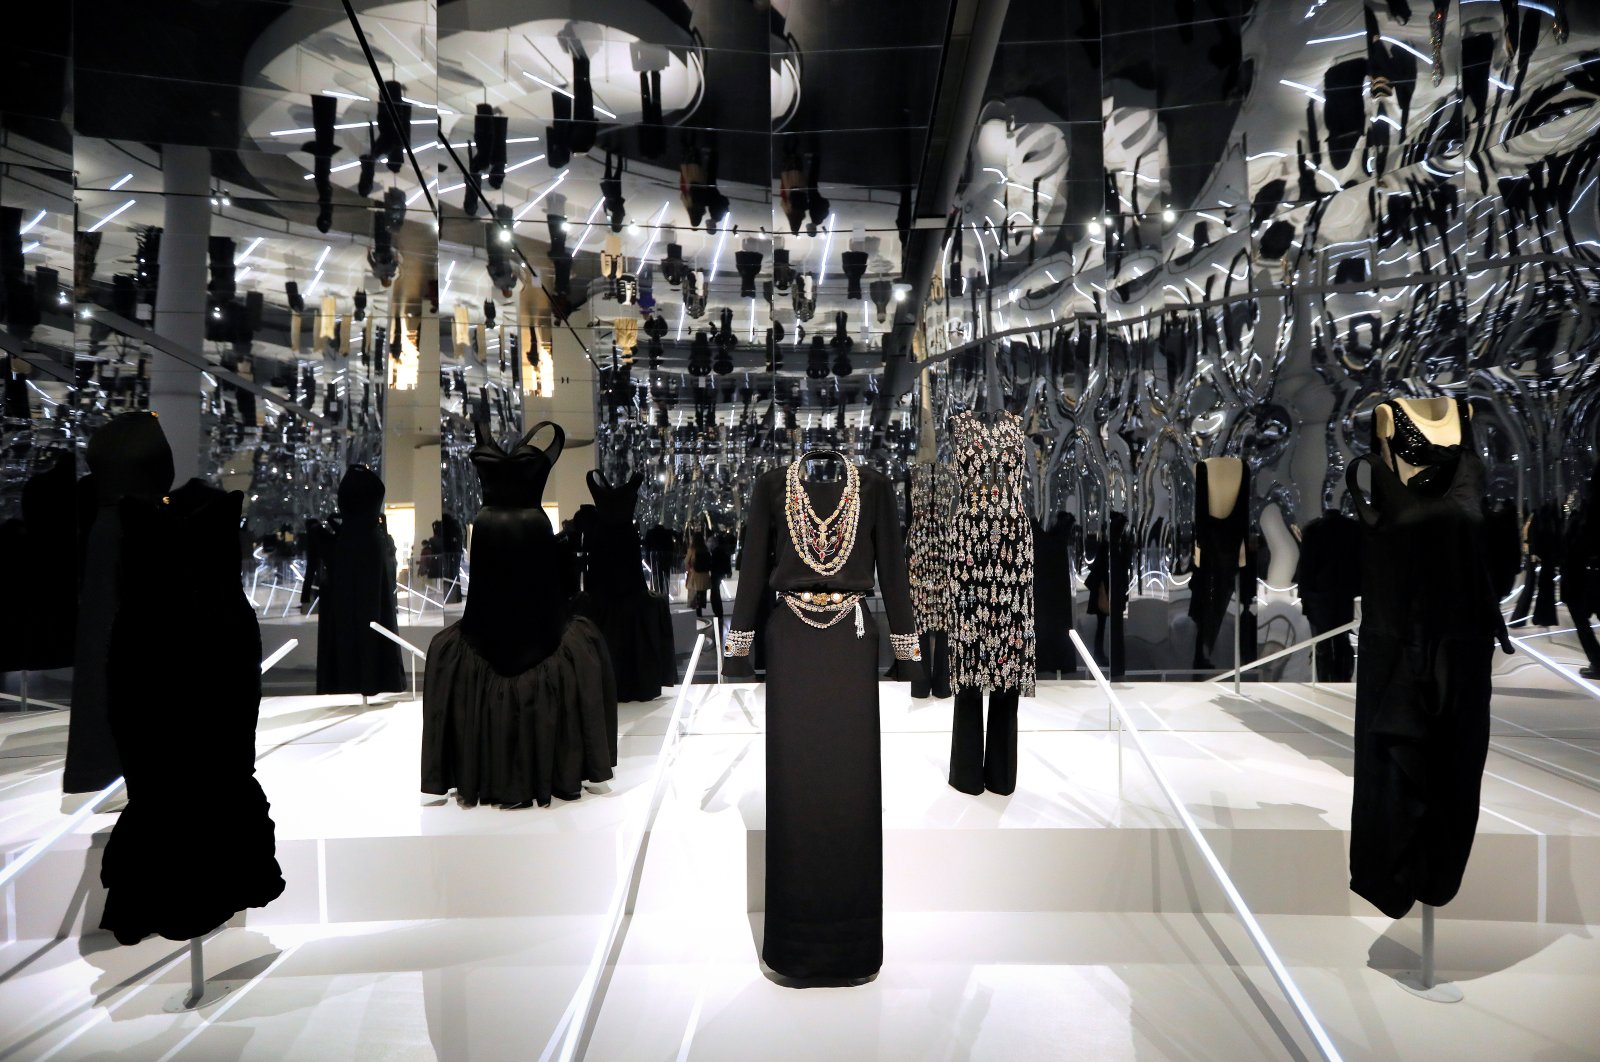 150 years of fashion - New York Metropolitan Museum